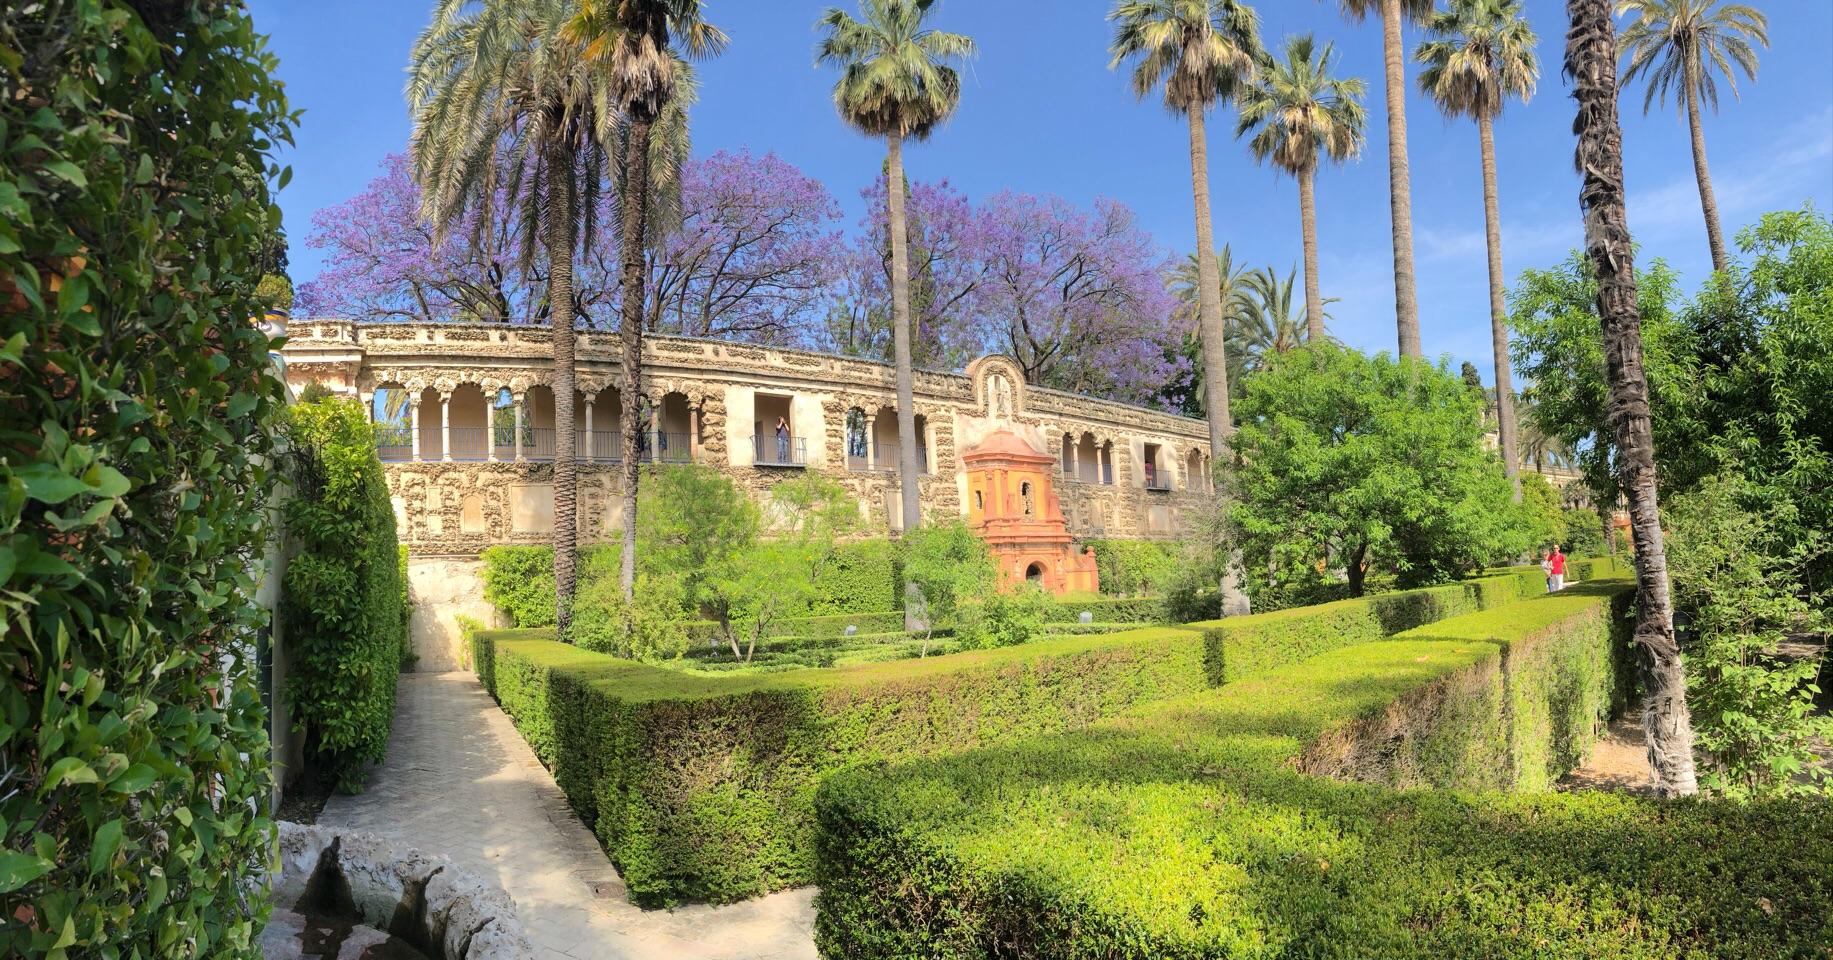 Seville Trip, Day 7